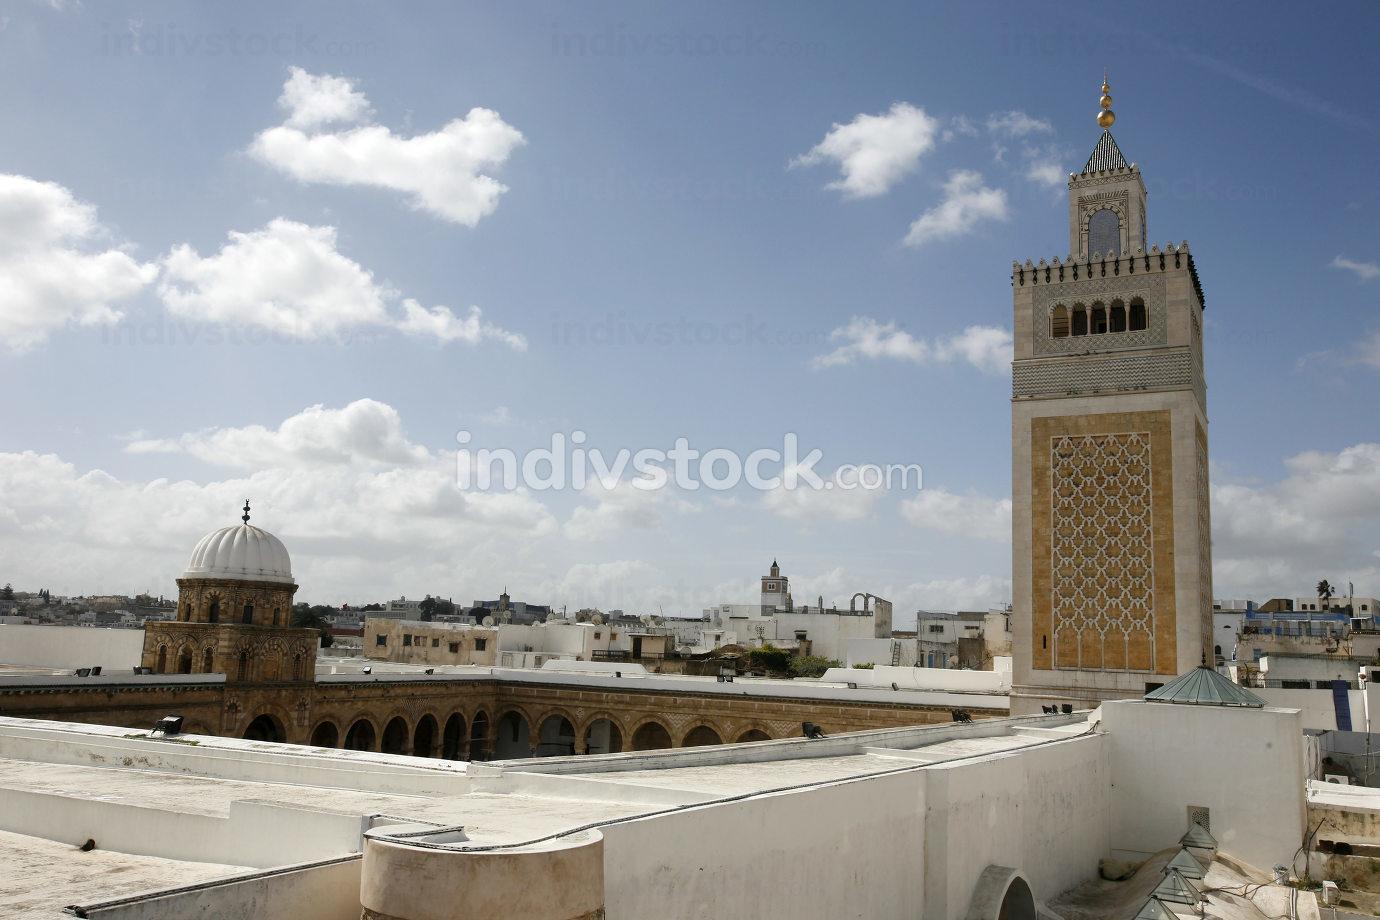 Tunisian Peootery in front of the Ez Zitouna or Al Zaytuna Mosque, Tunisia, Sidi Bou Sair, March, 2009